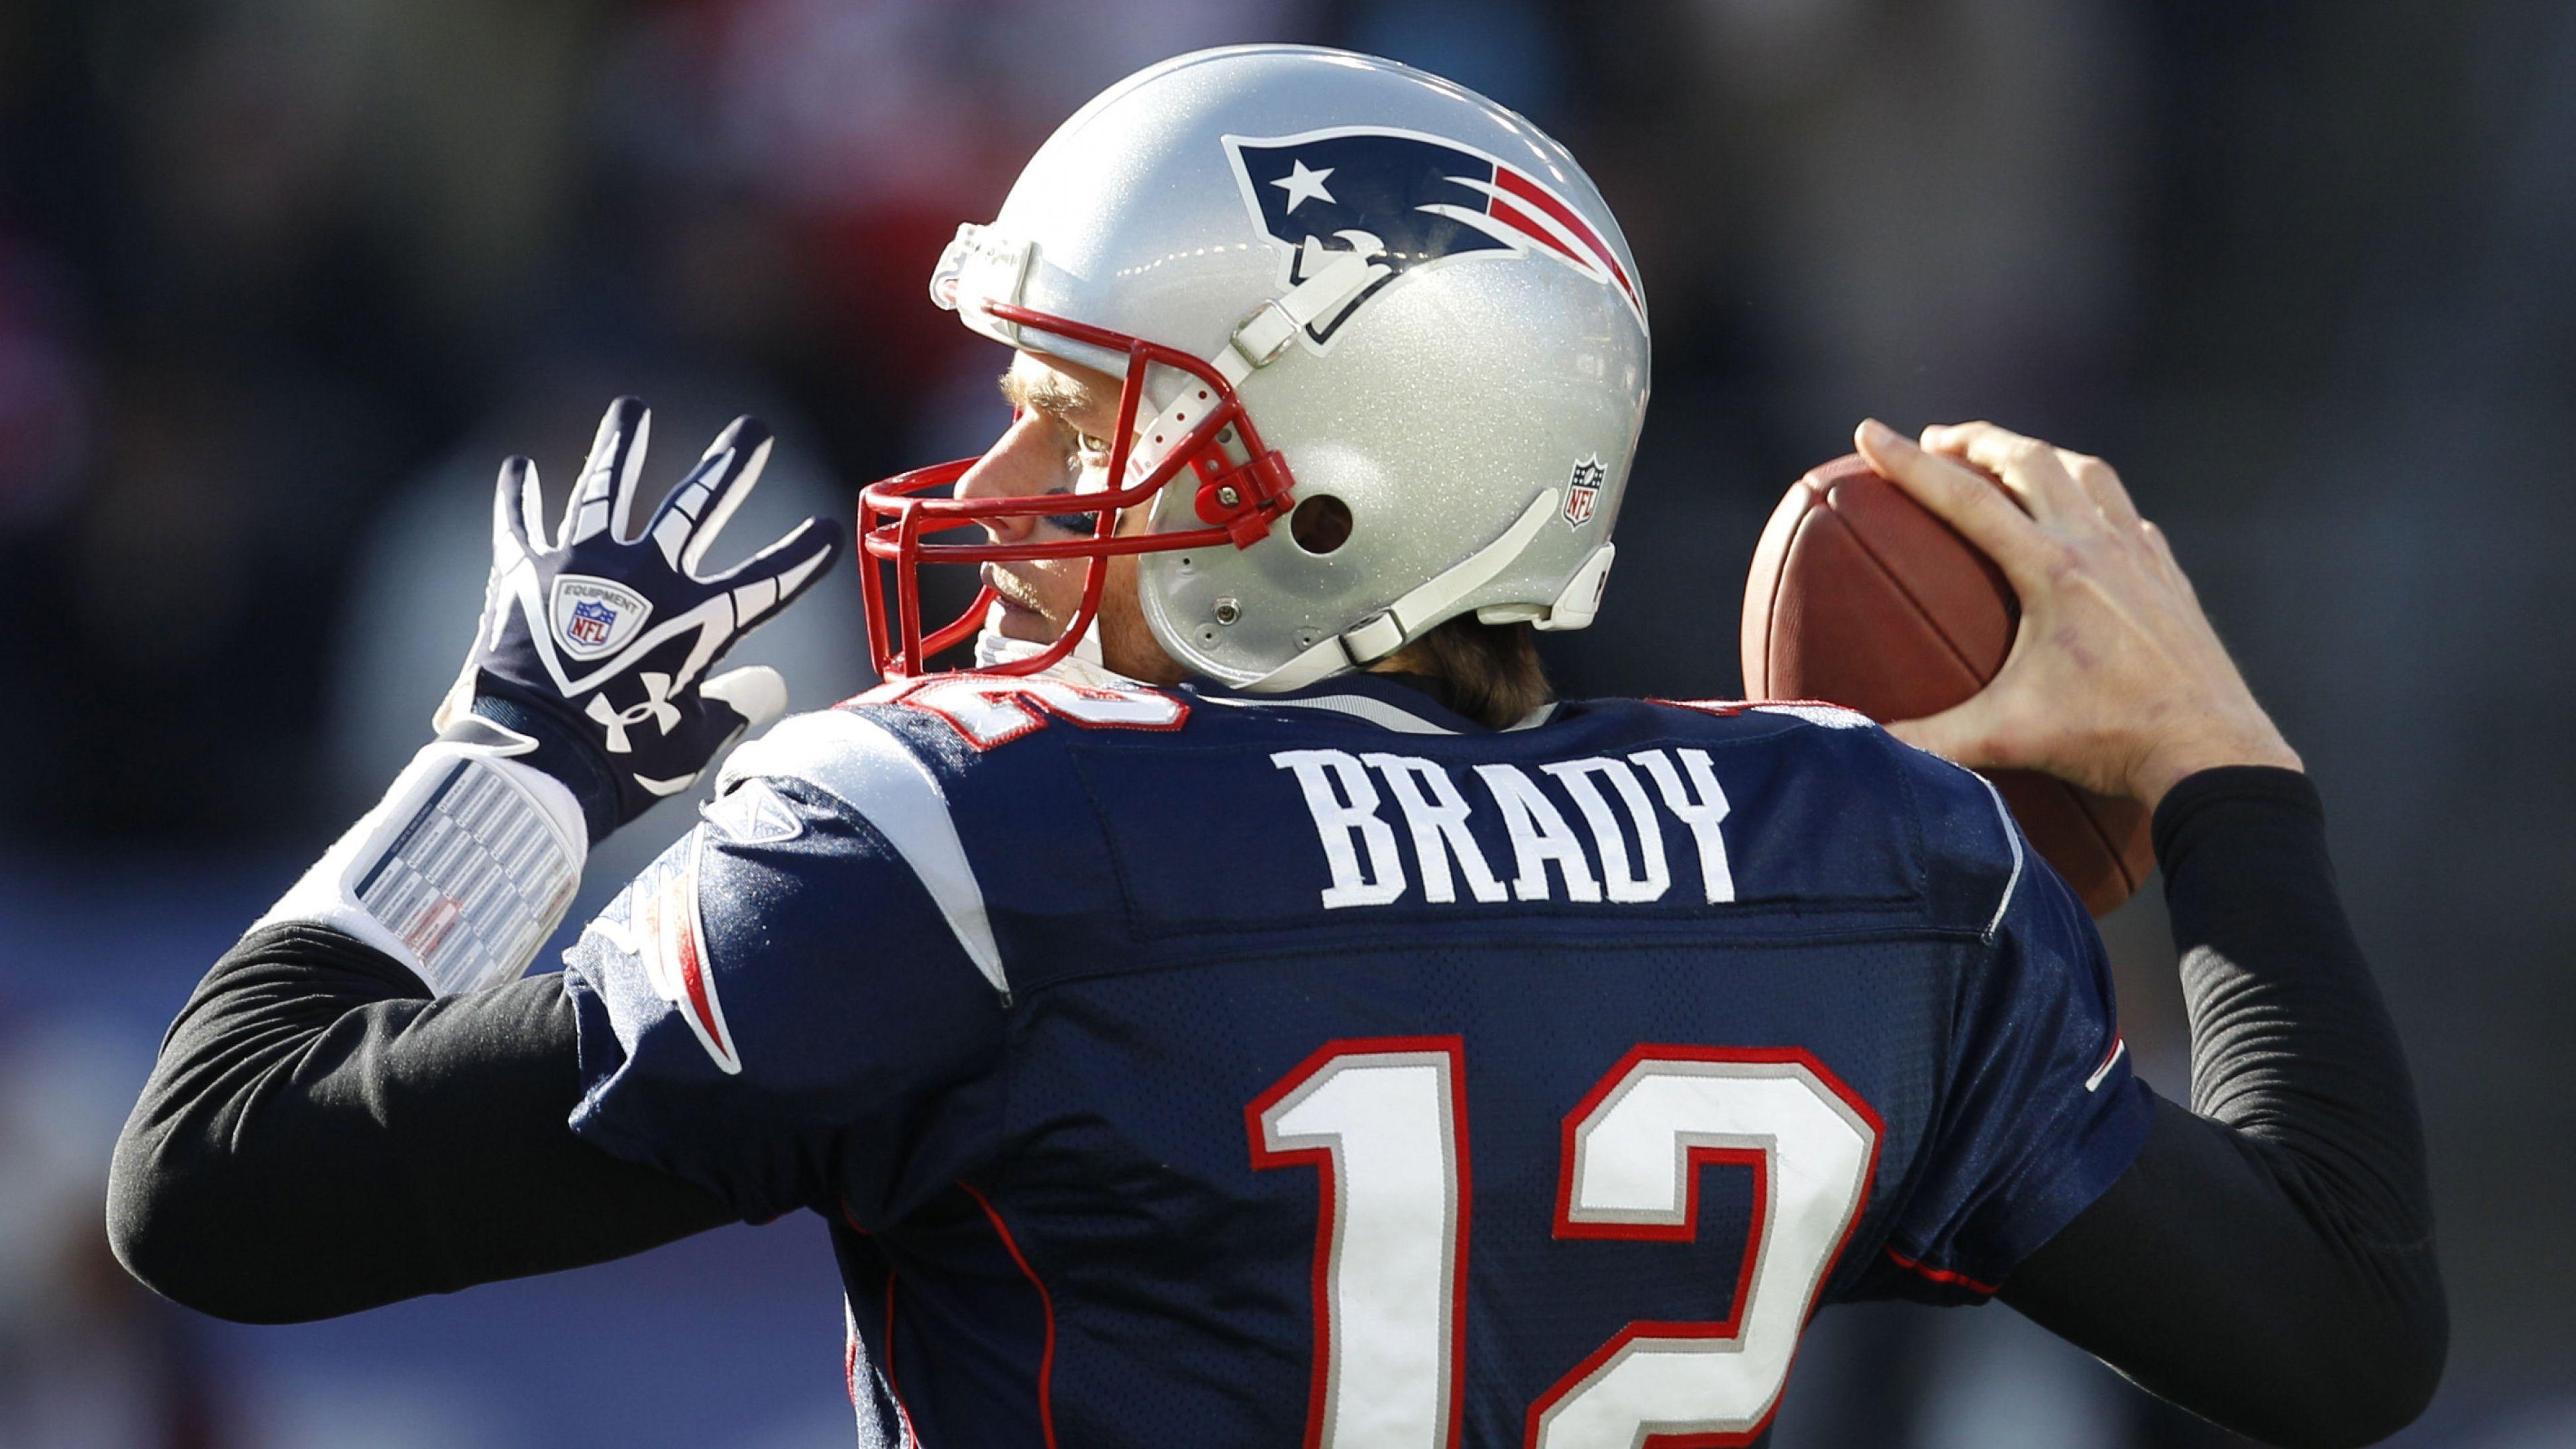 Tom Brady Wallpapers Top Free Tom Brady Backgrounds Wallpaperaccess